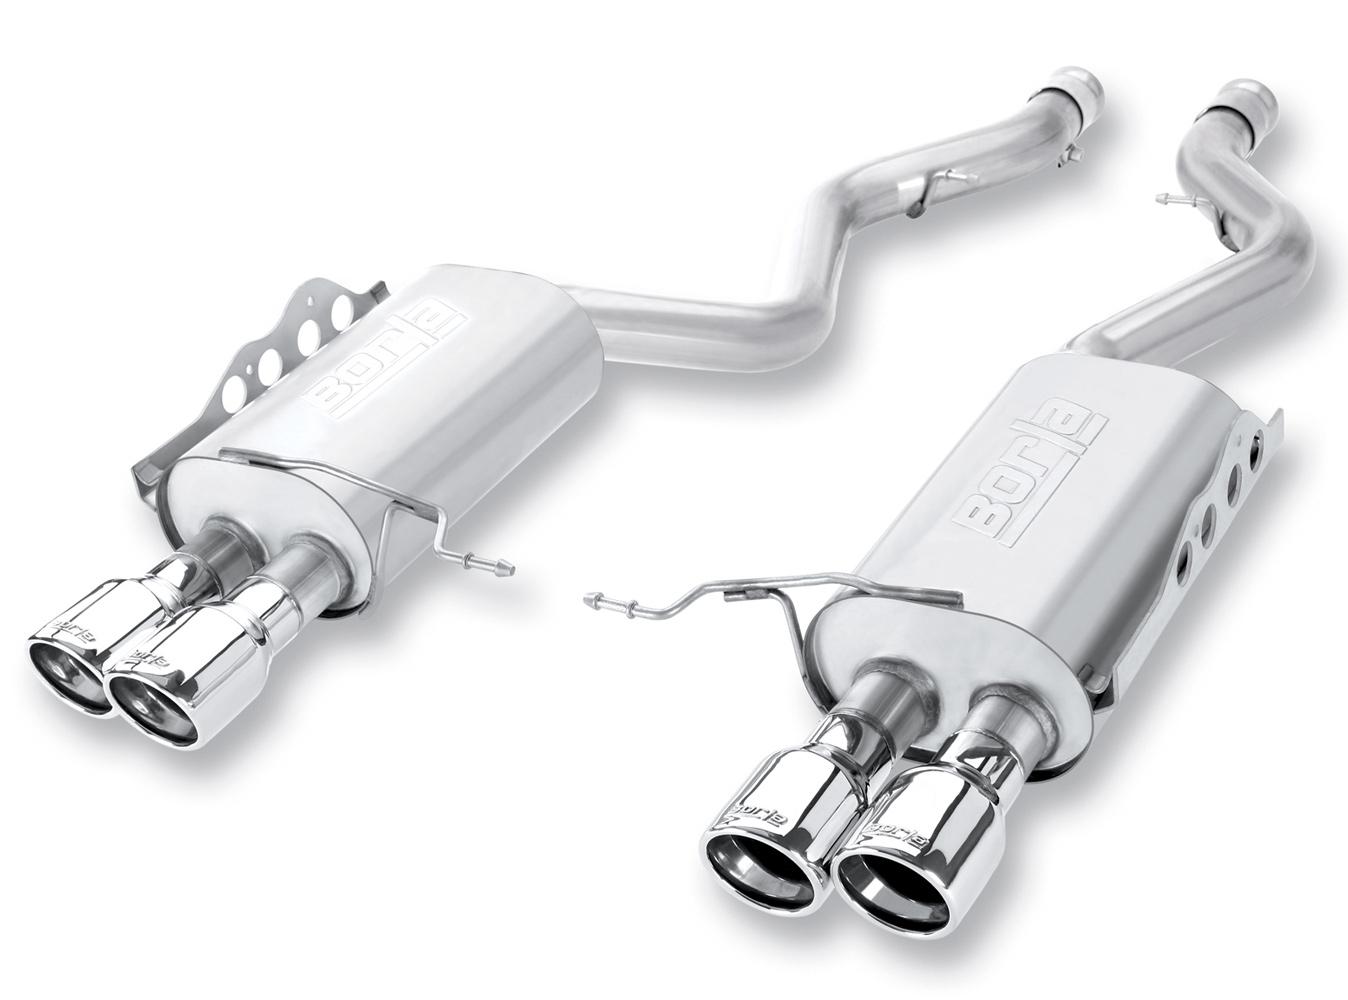 borla exhaust system 140628